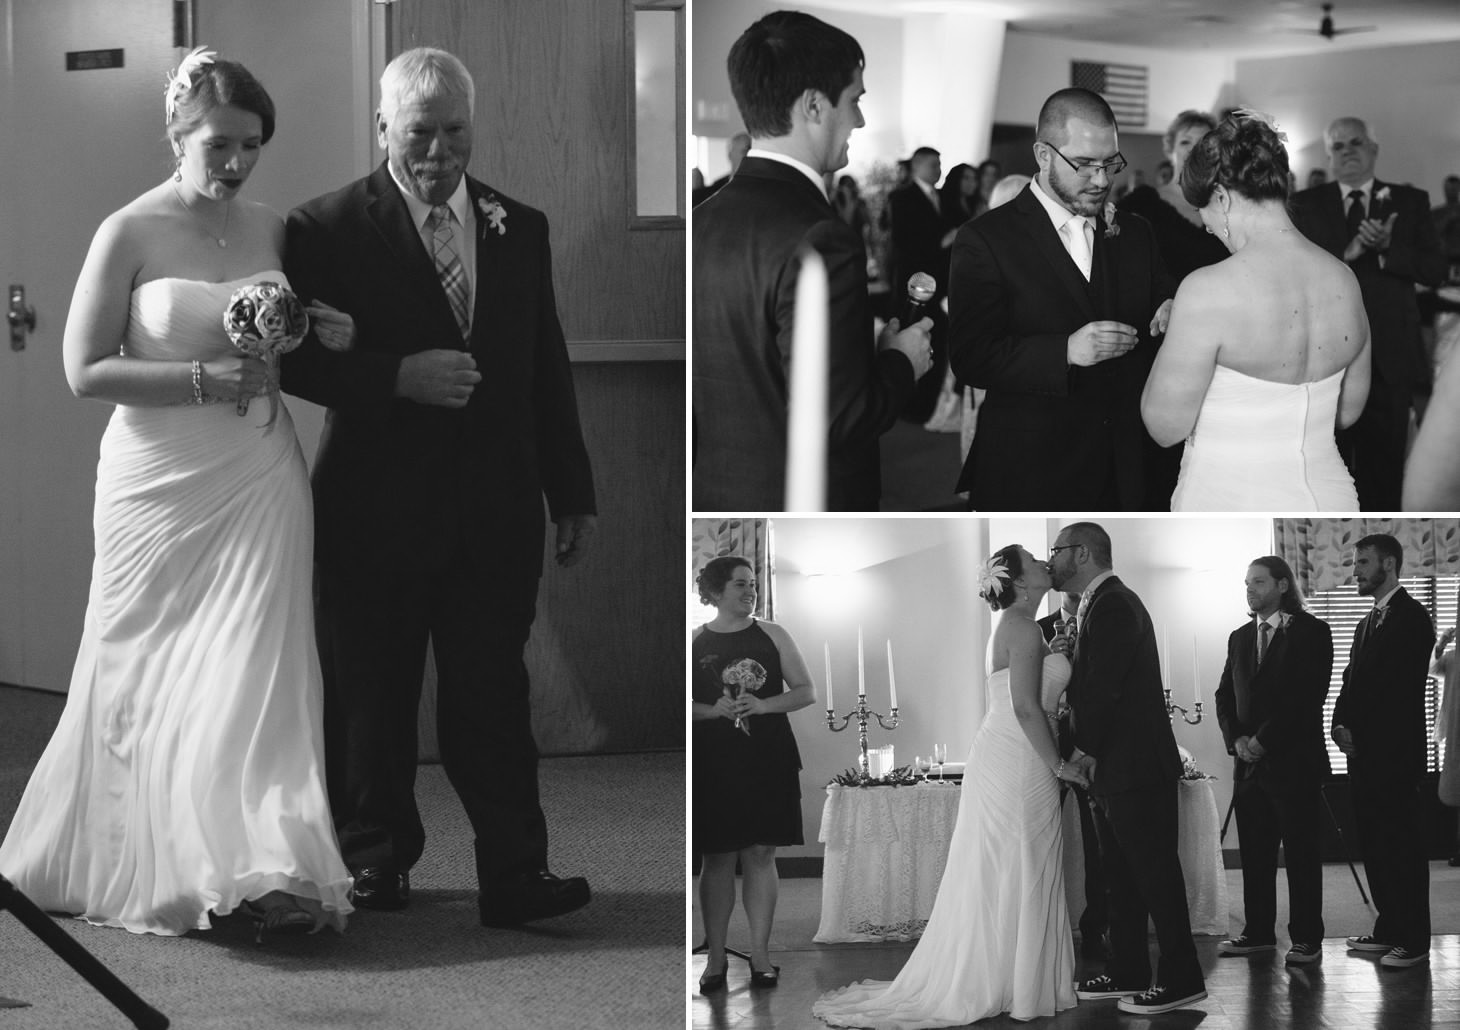 025-nyc-wedding-photographer-nj-nerdy-dr-who-firehouse-wedding-smitten-chickens.jpg